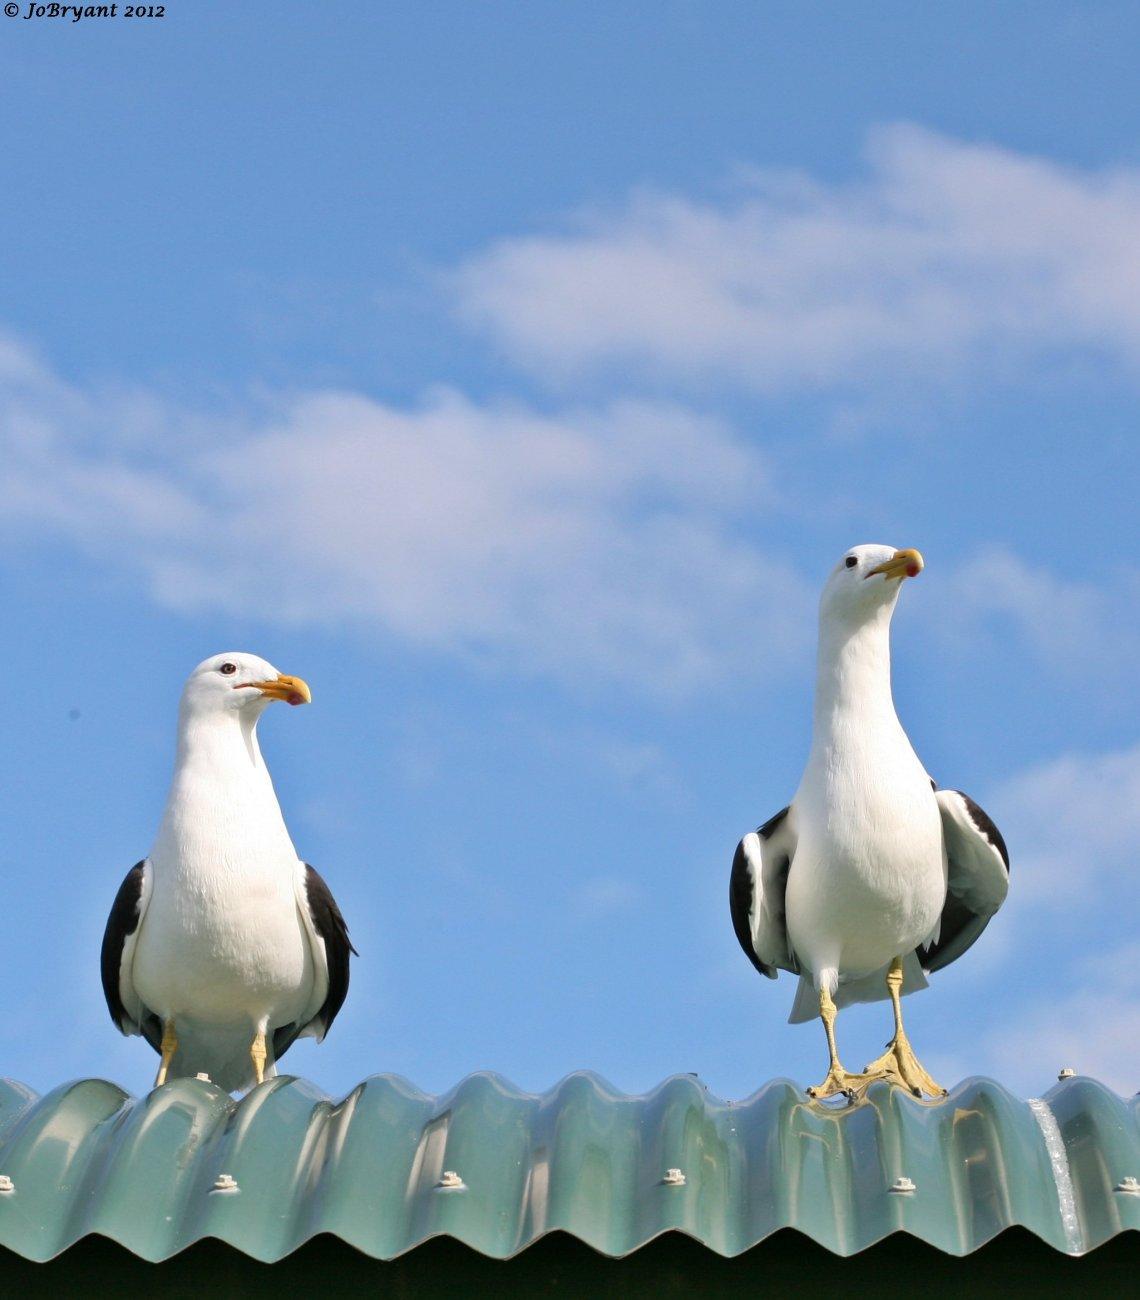 Black-backed gulls